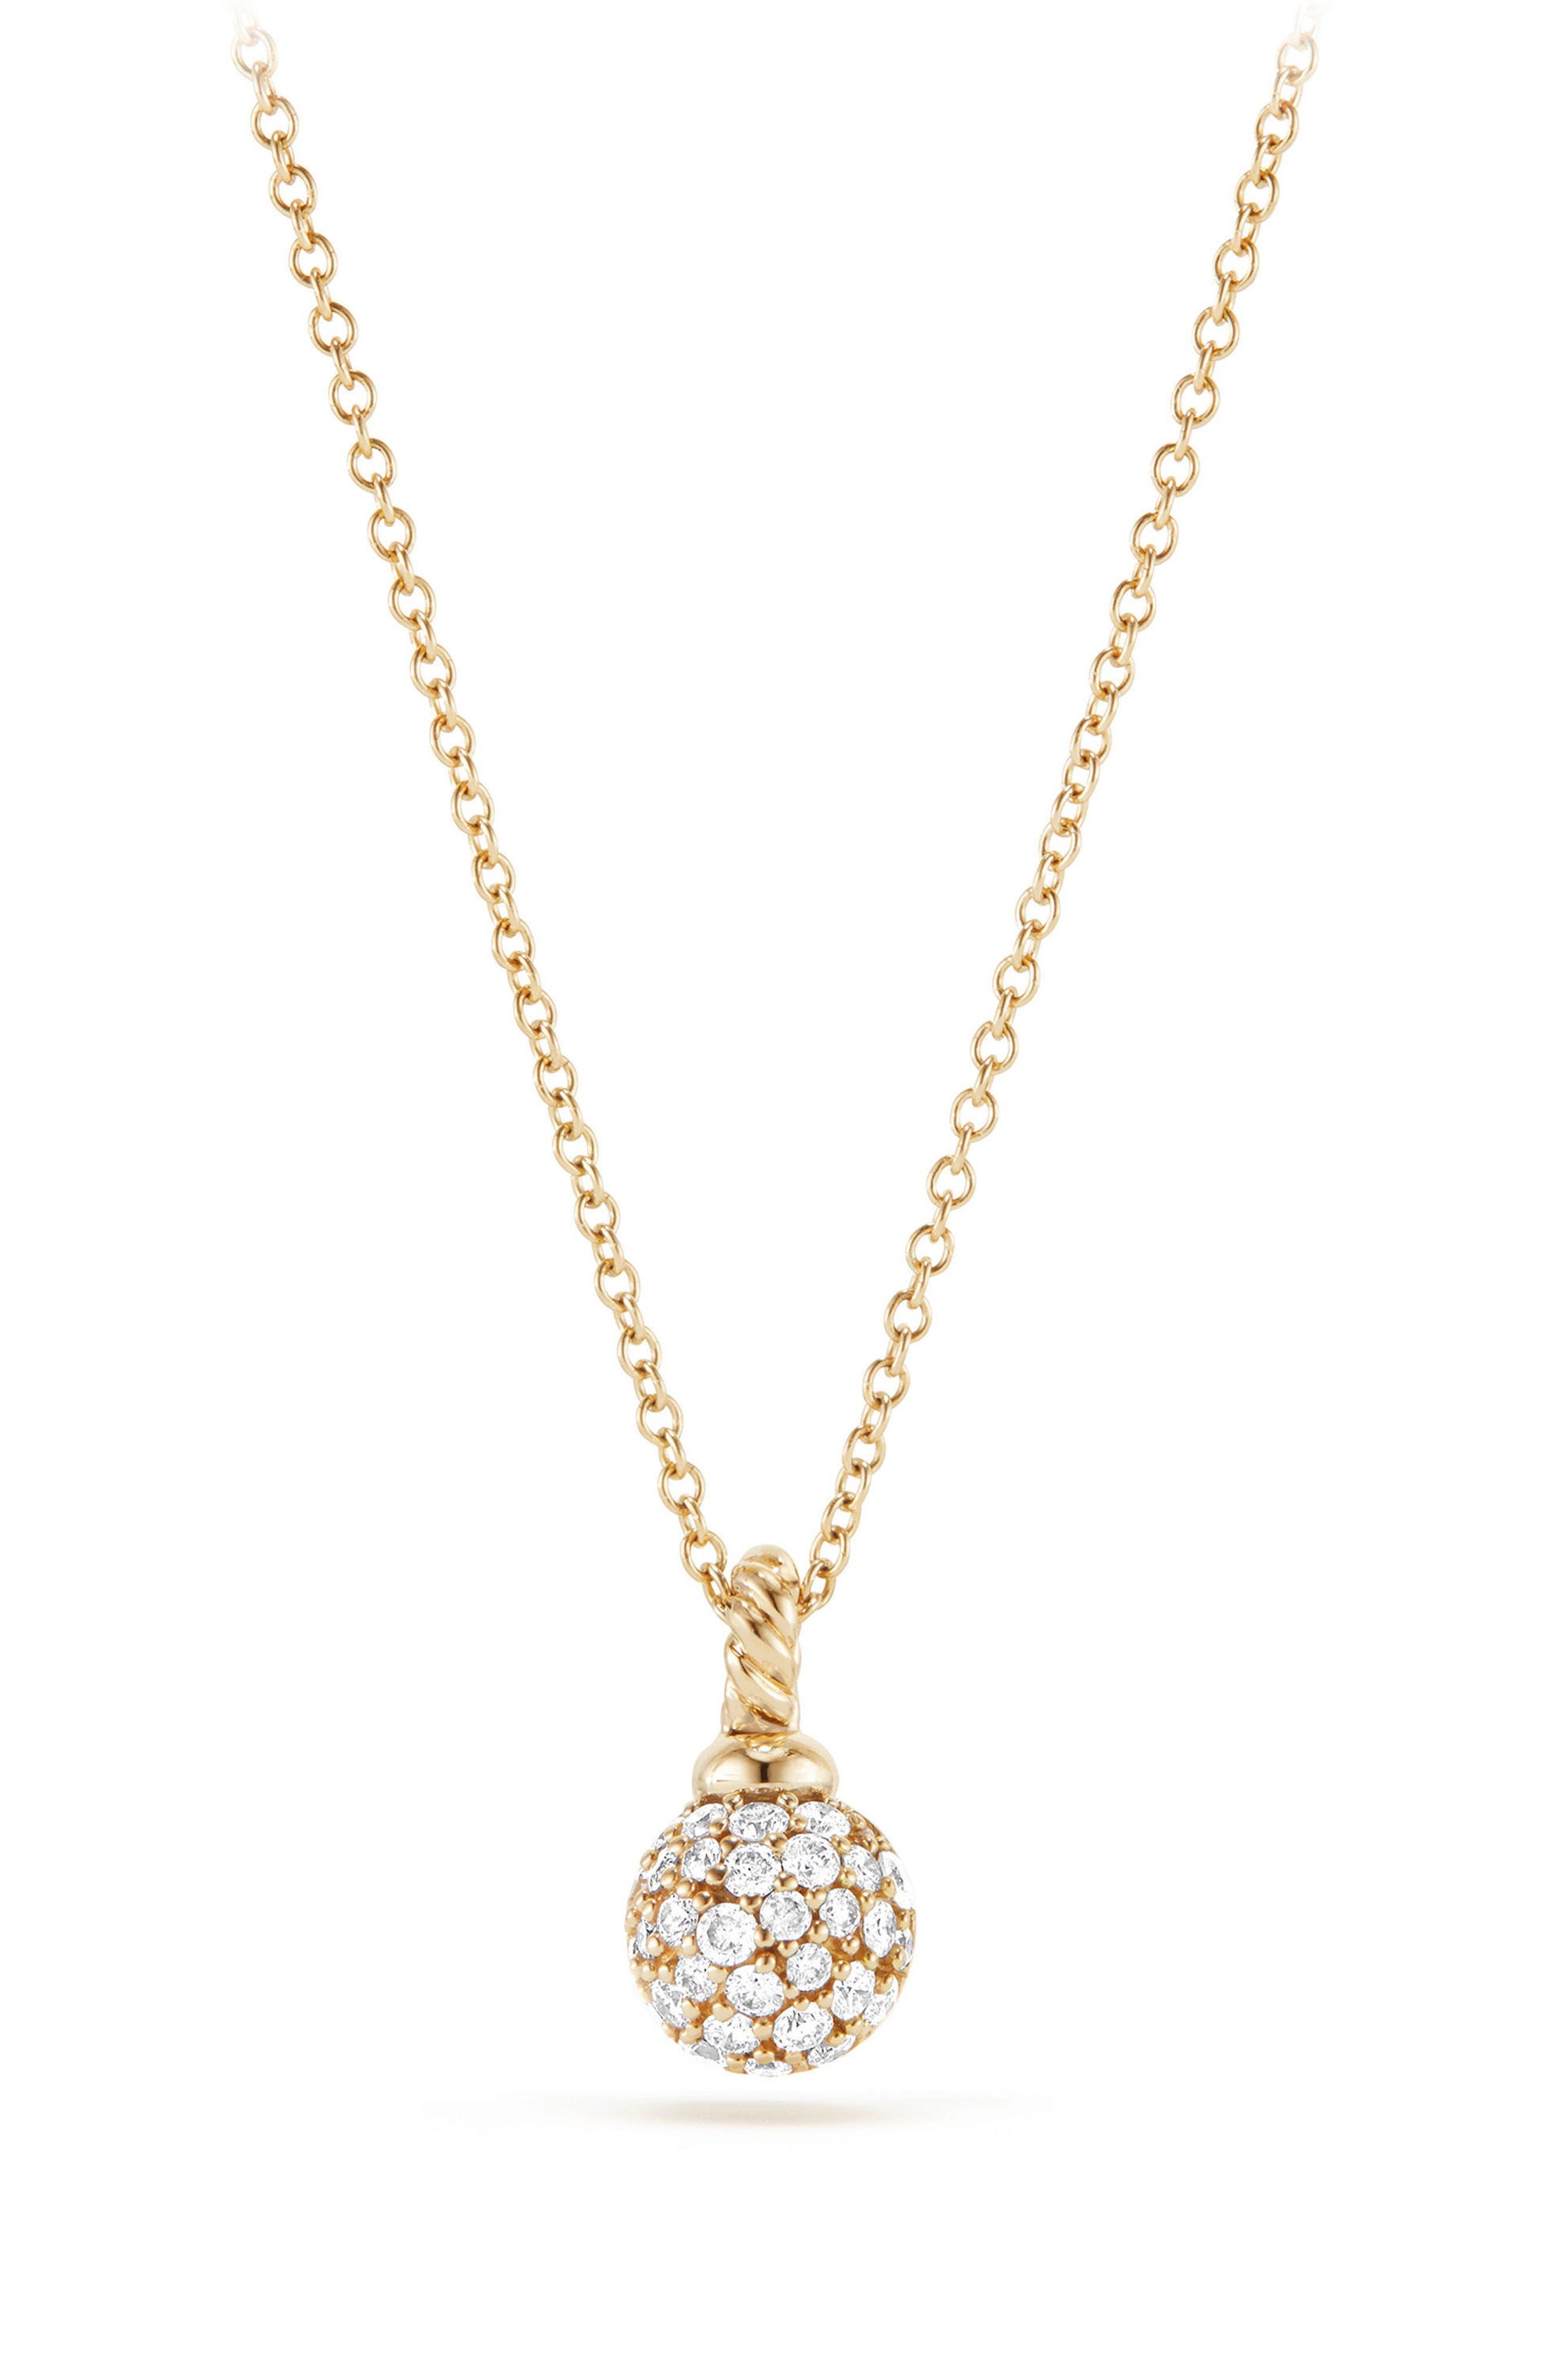 Petite Solari Pavé Necklace with Diamonds in 18K Gold,                         Main,                         color, Yellow Gold/ Diamond